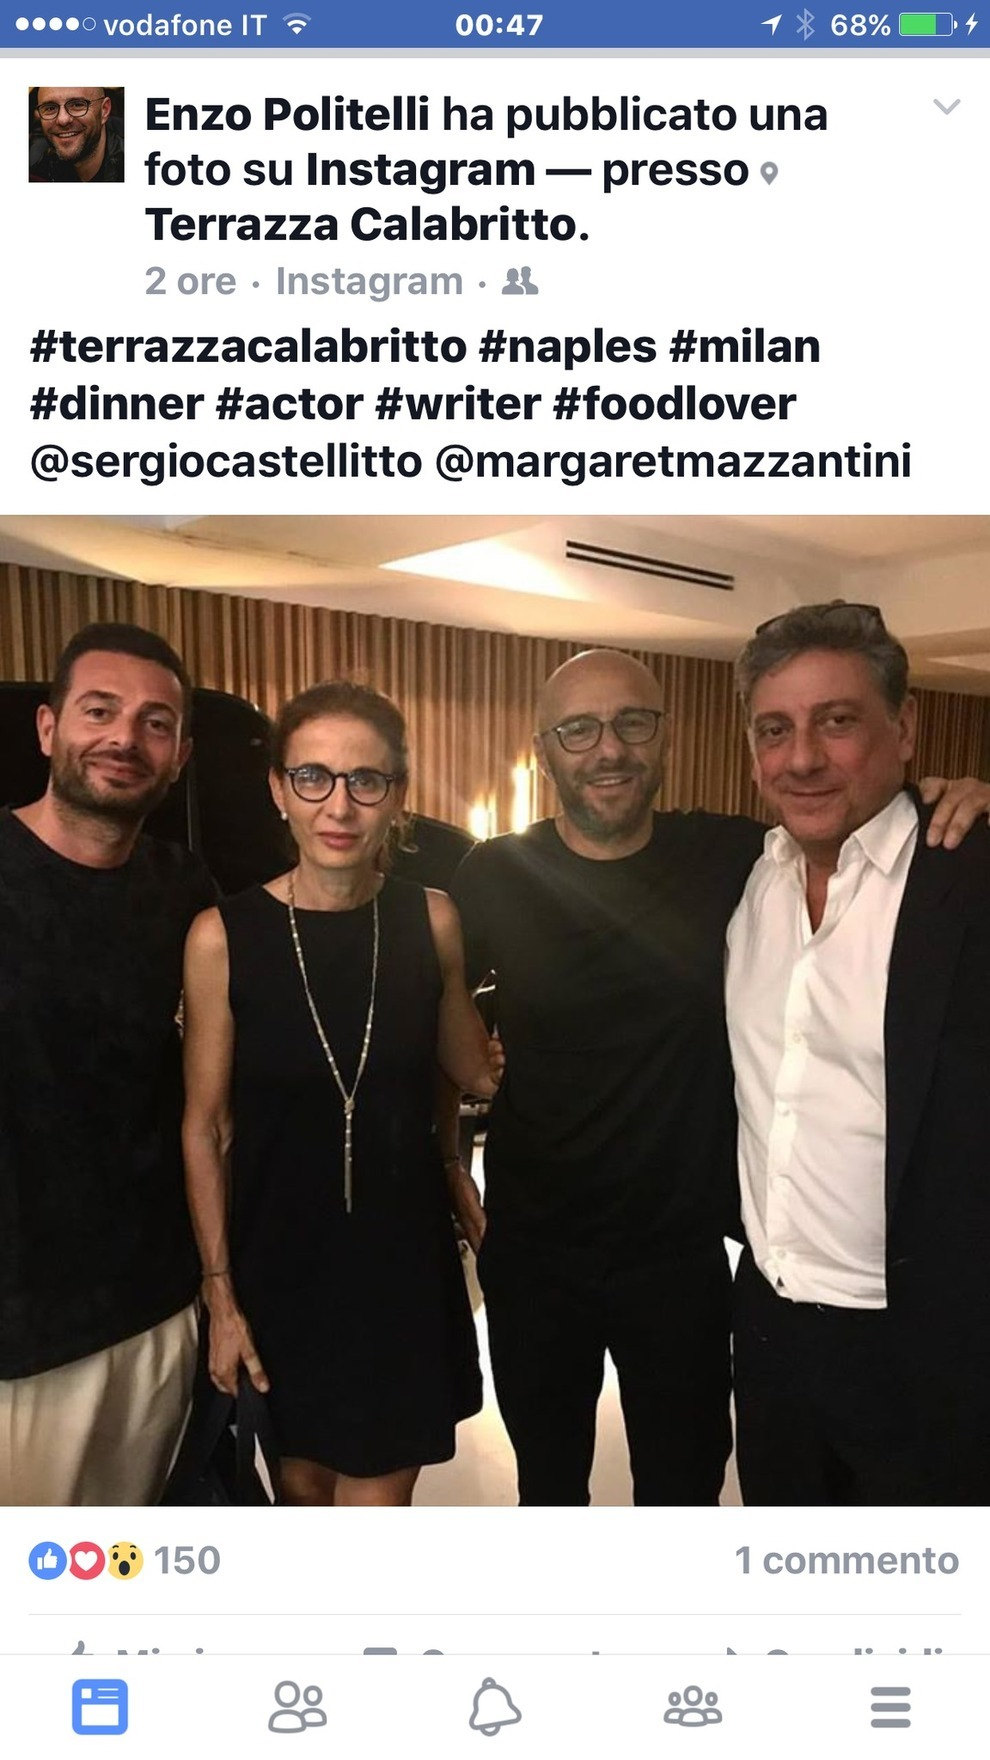 Serata Napoletana Per Sergio Castellitto E Margaret